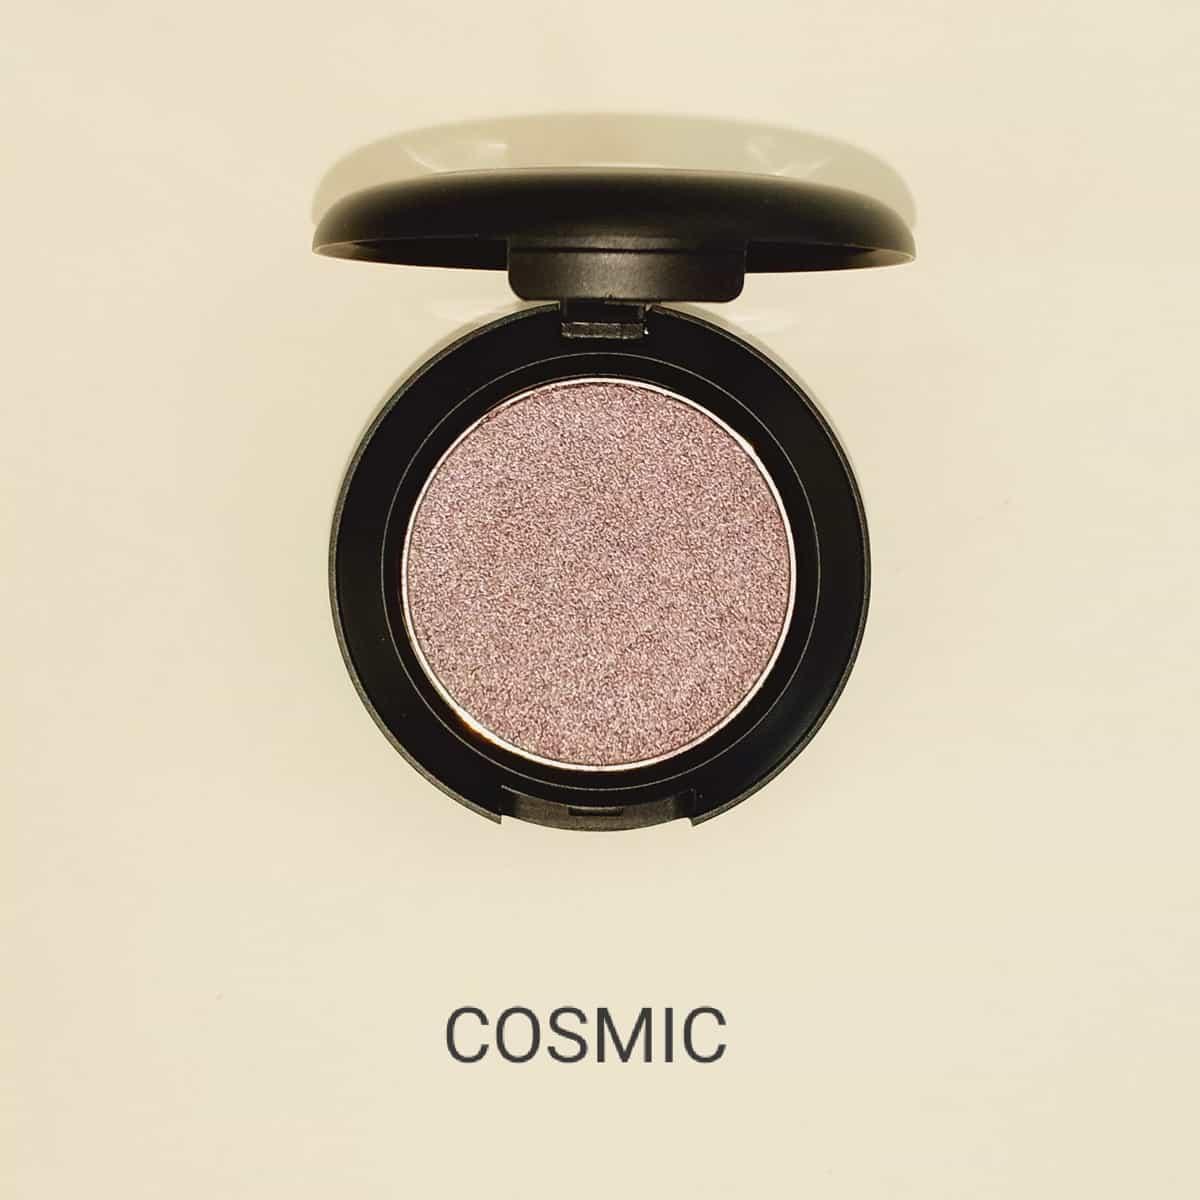 Cosmic-min